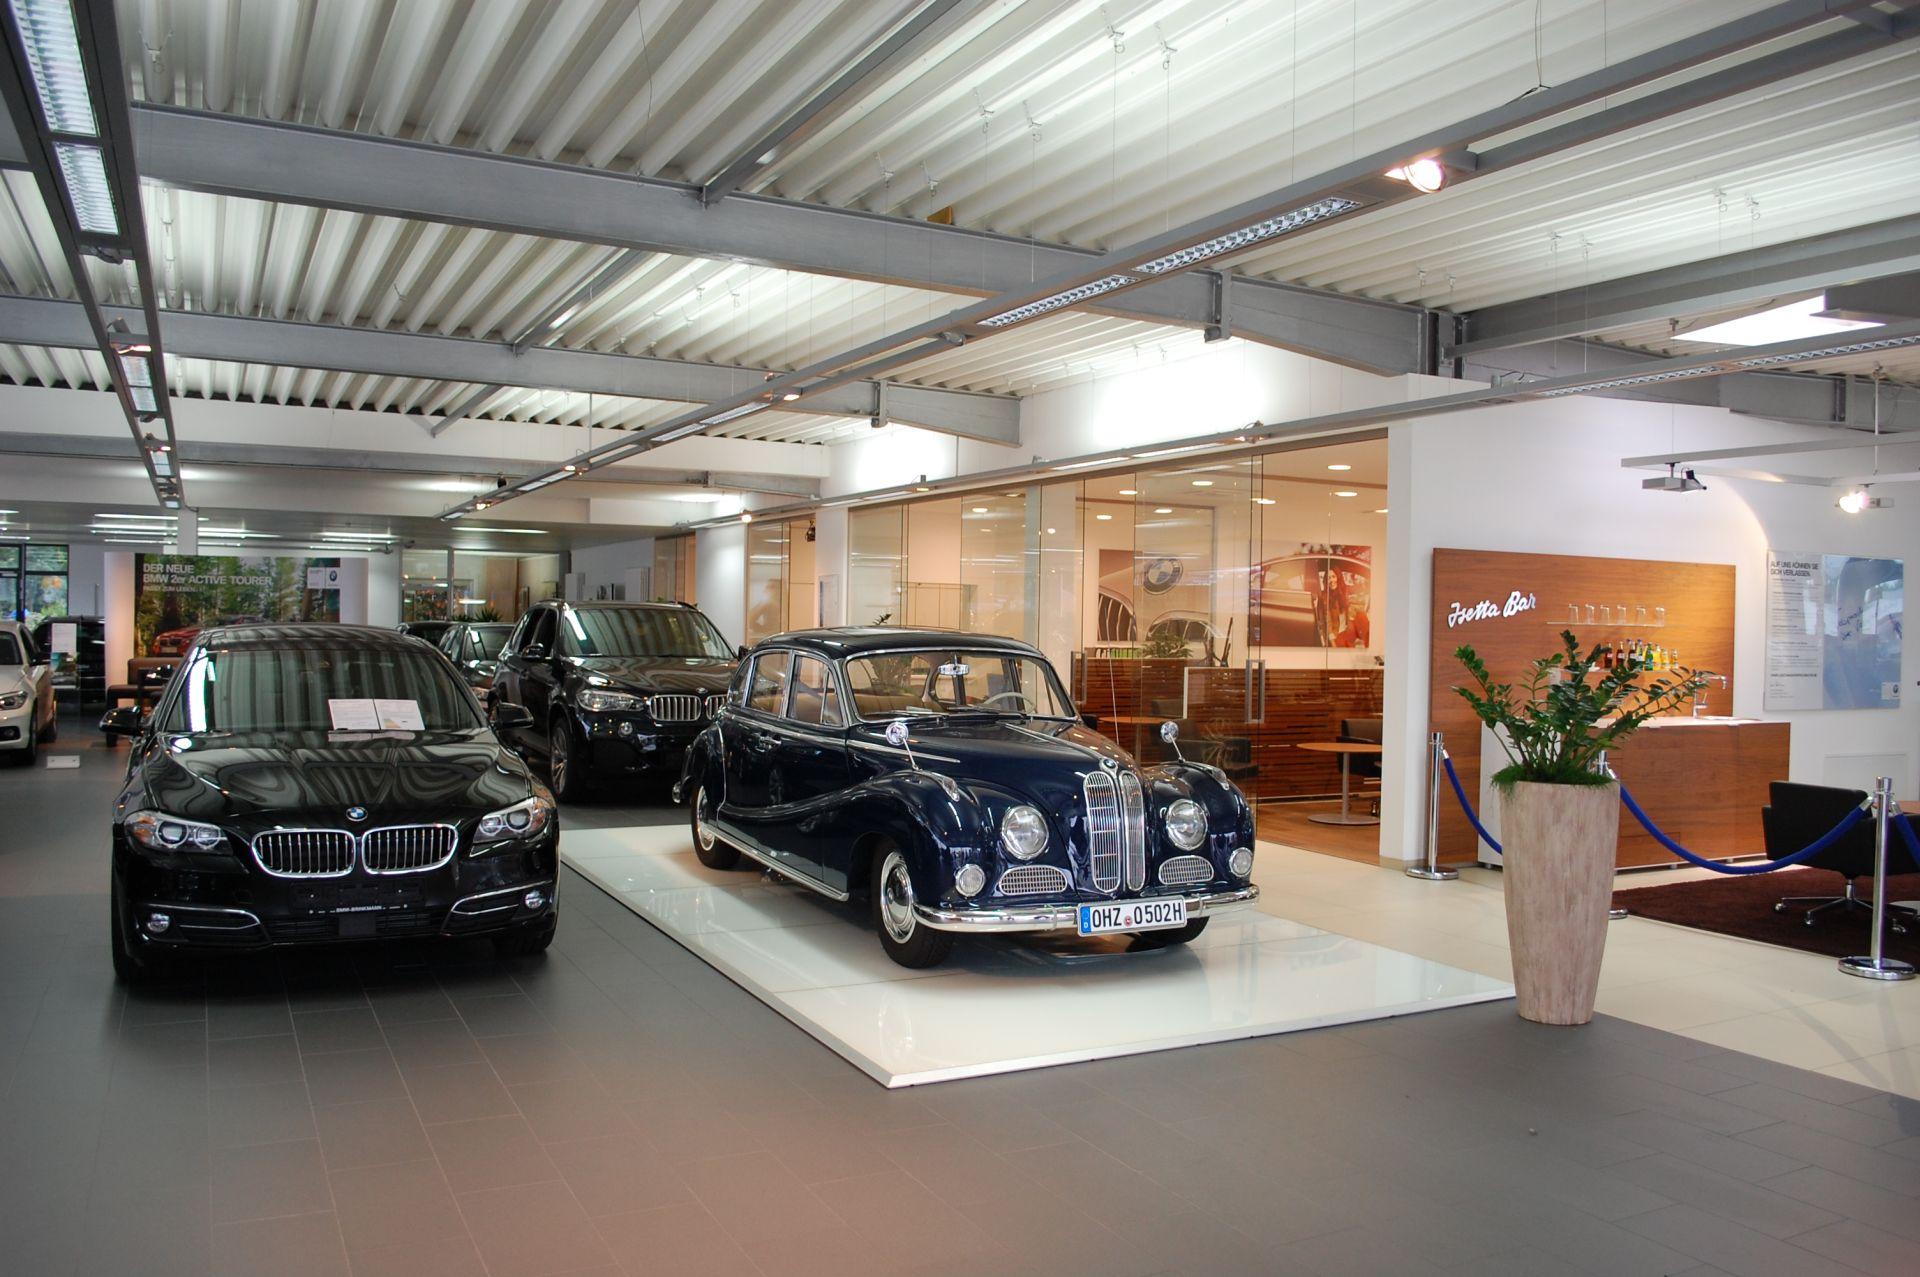 autohaus e brinkmann referenzkundenblog von pflanzk beln ae trade online. Black Bedroom Furniture Sets. Home Design Ideas